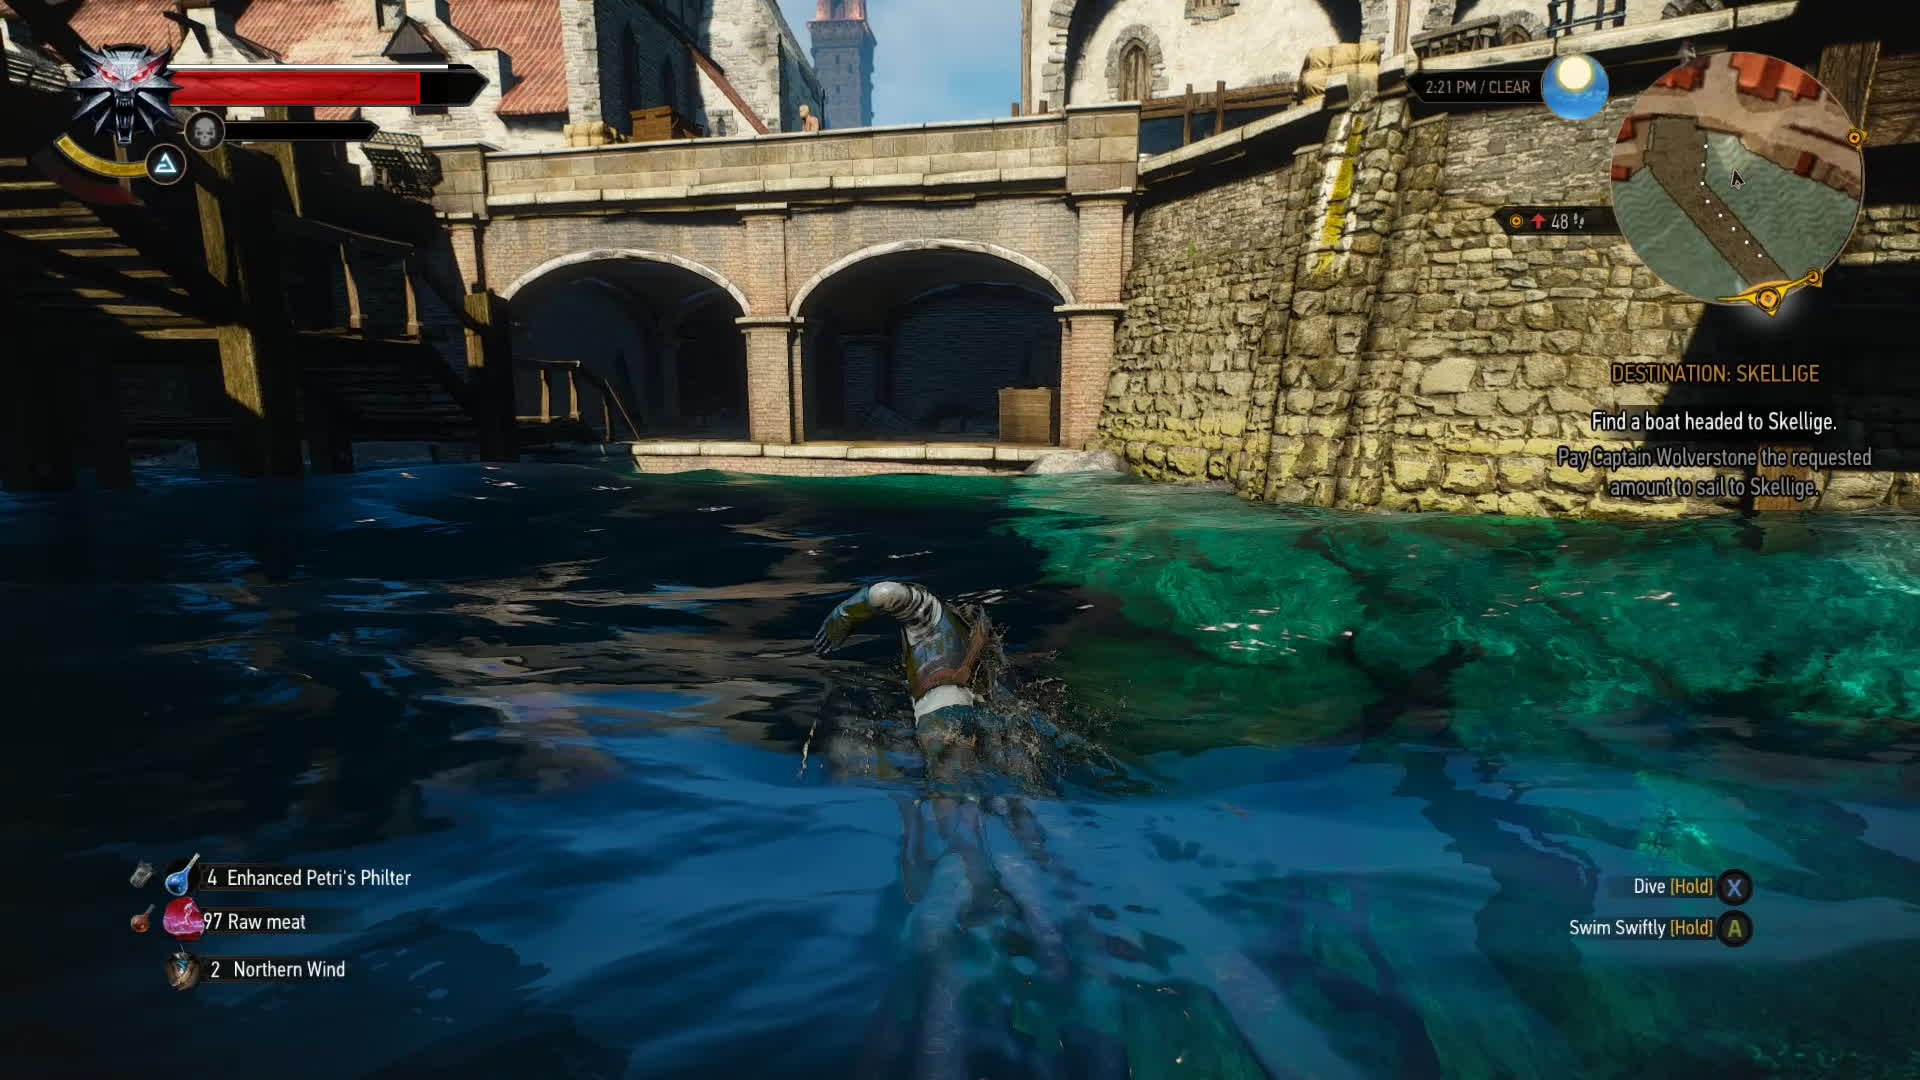 witcher 3, swimming GIFs